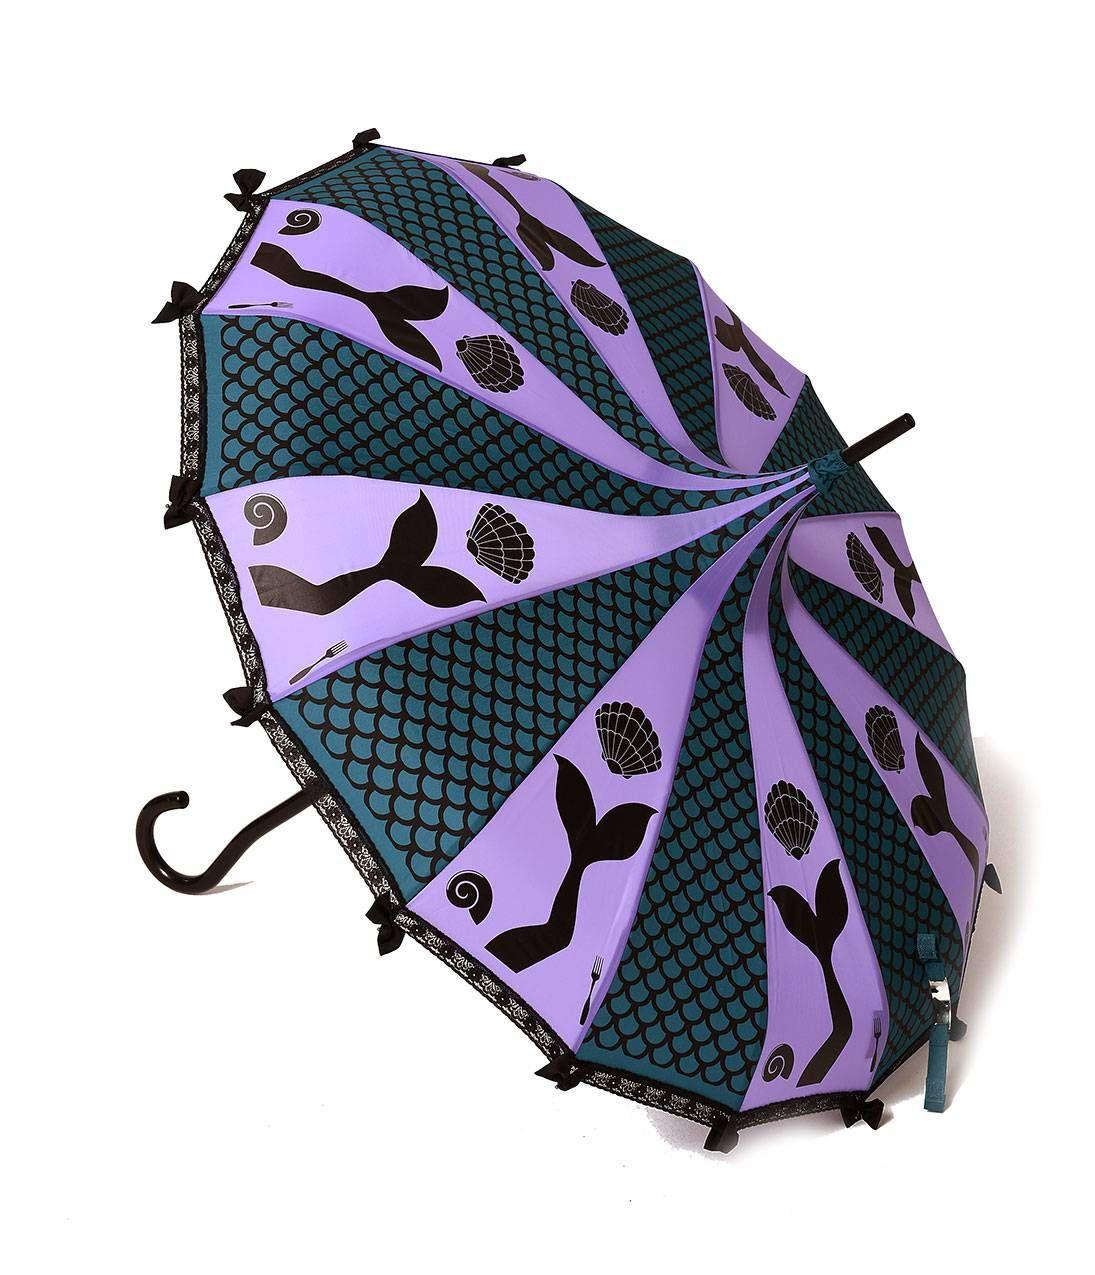 Beautiful Vintage Style Disney Inspired Umbrellas Pagoda Umbrella Umbrella Mermaid